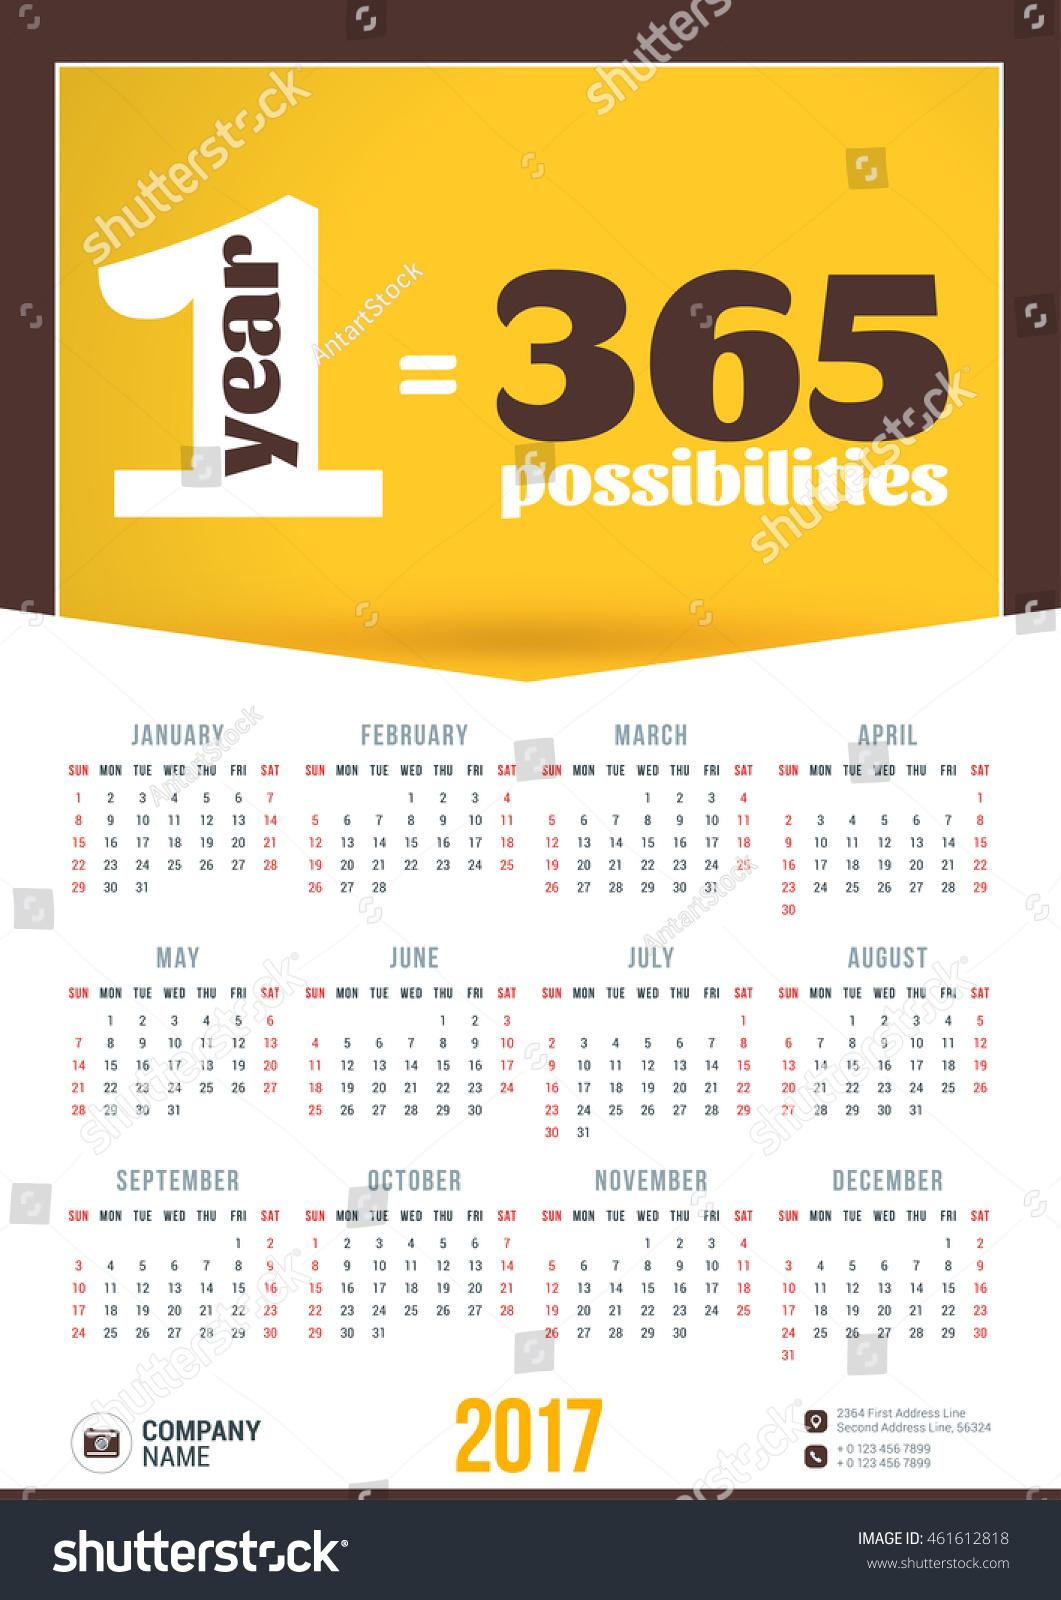 picture 2017 Poster Calendar Template shutterstock